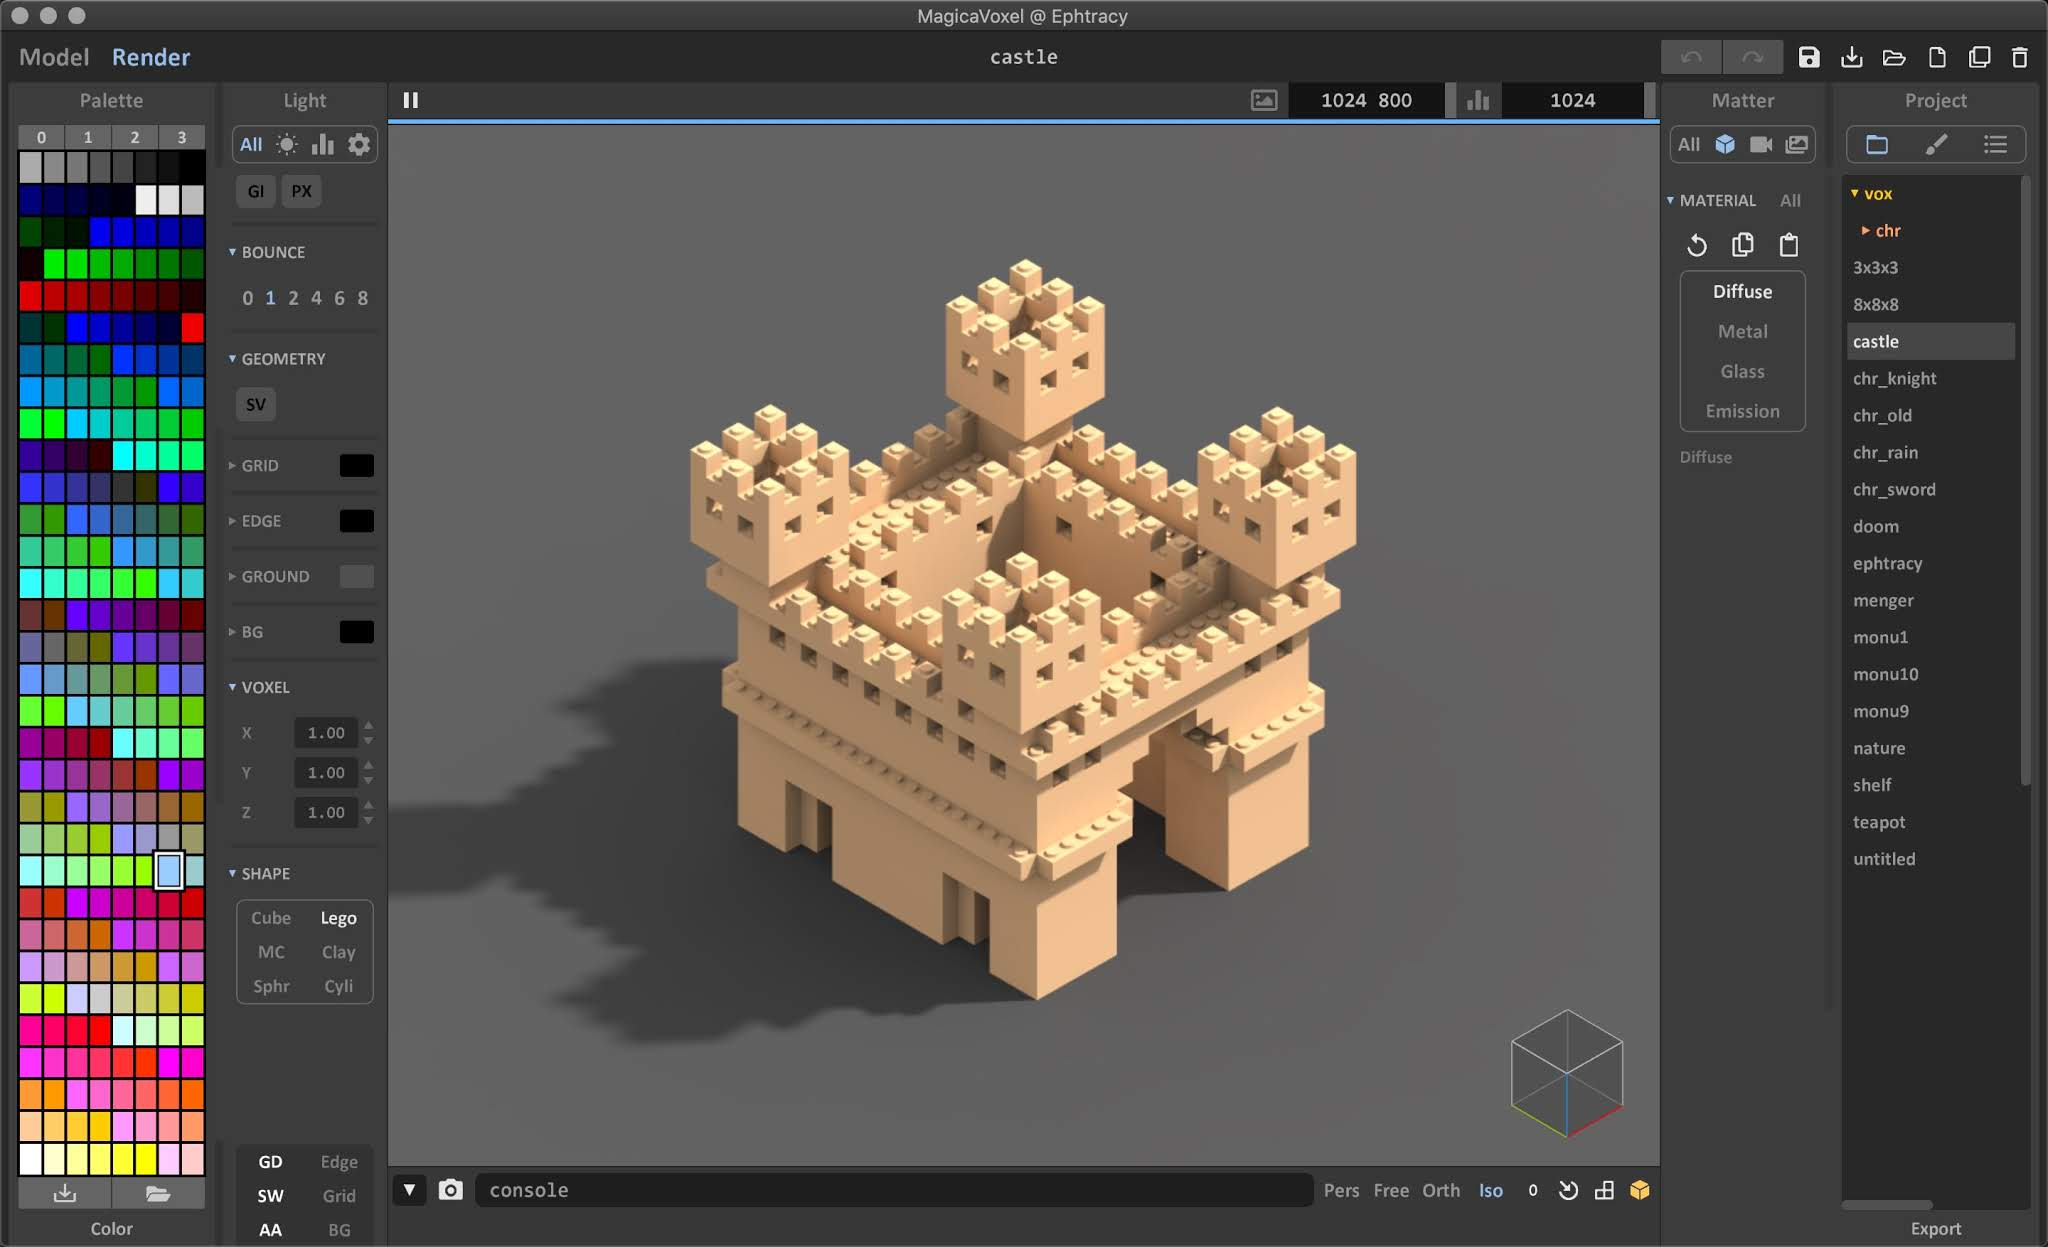 LEGO shape in MagicaVoxel